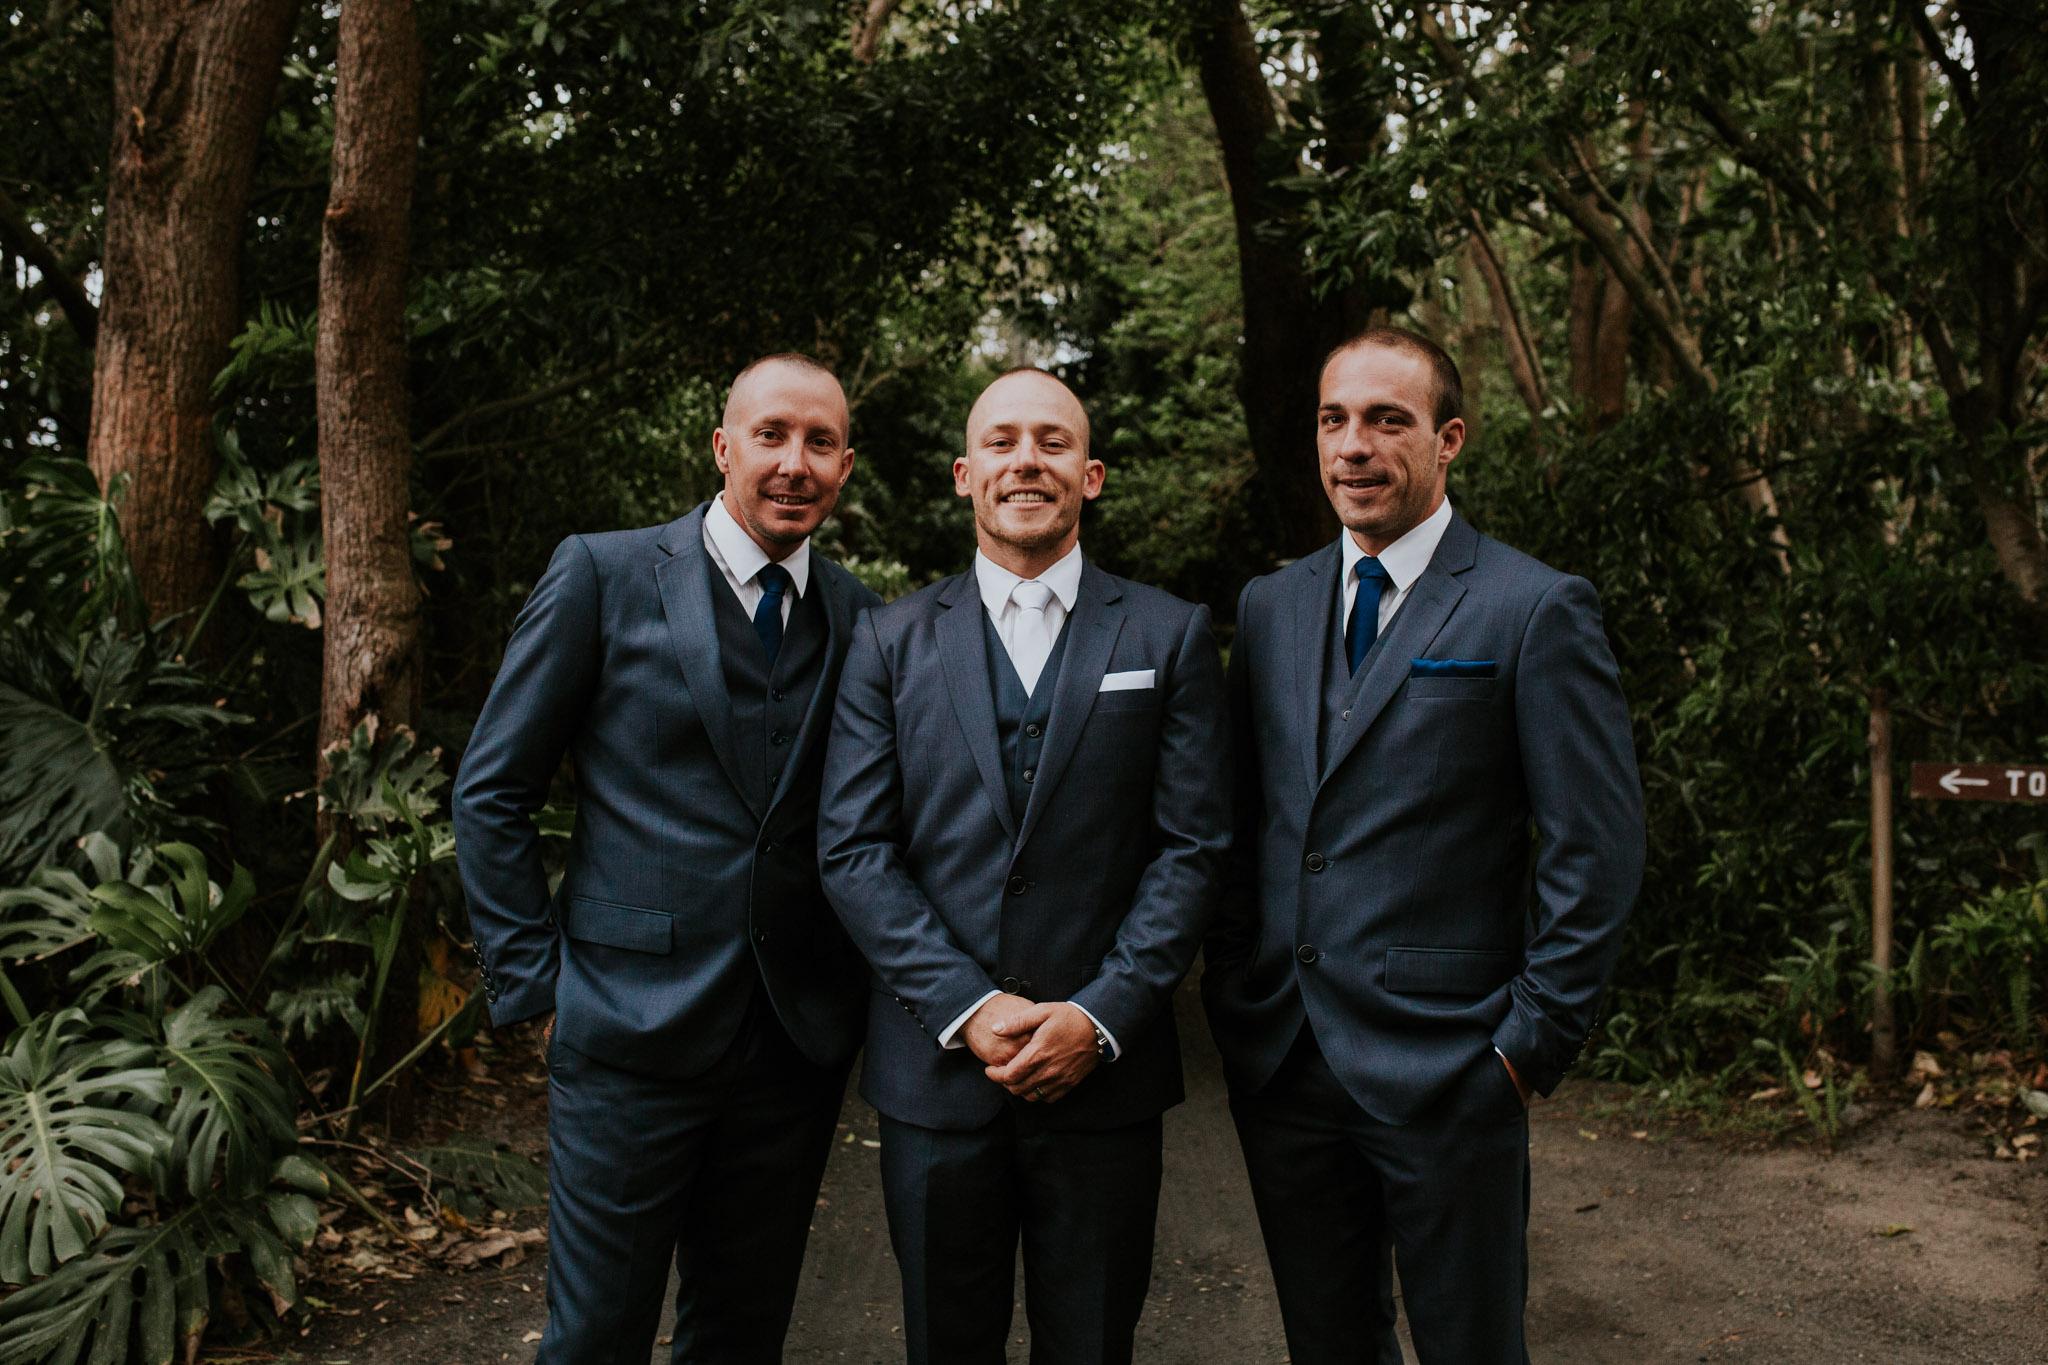 Shanan & Traci_Portkembla Golf Course Wedding-44.jpg